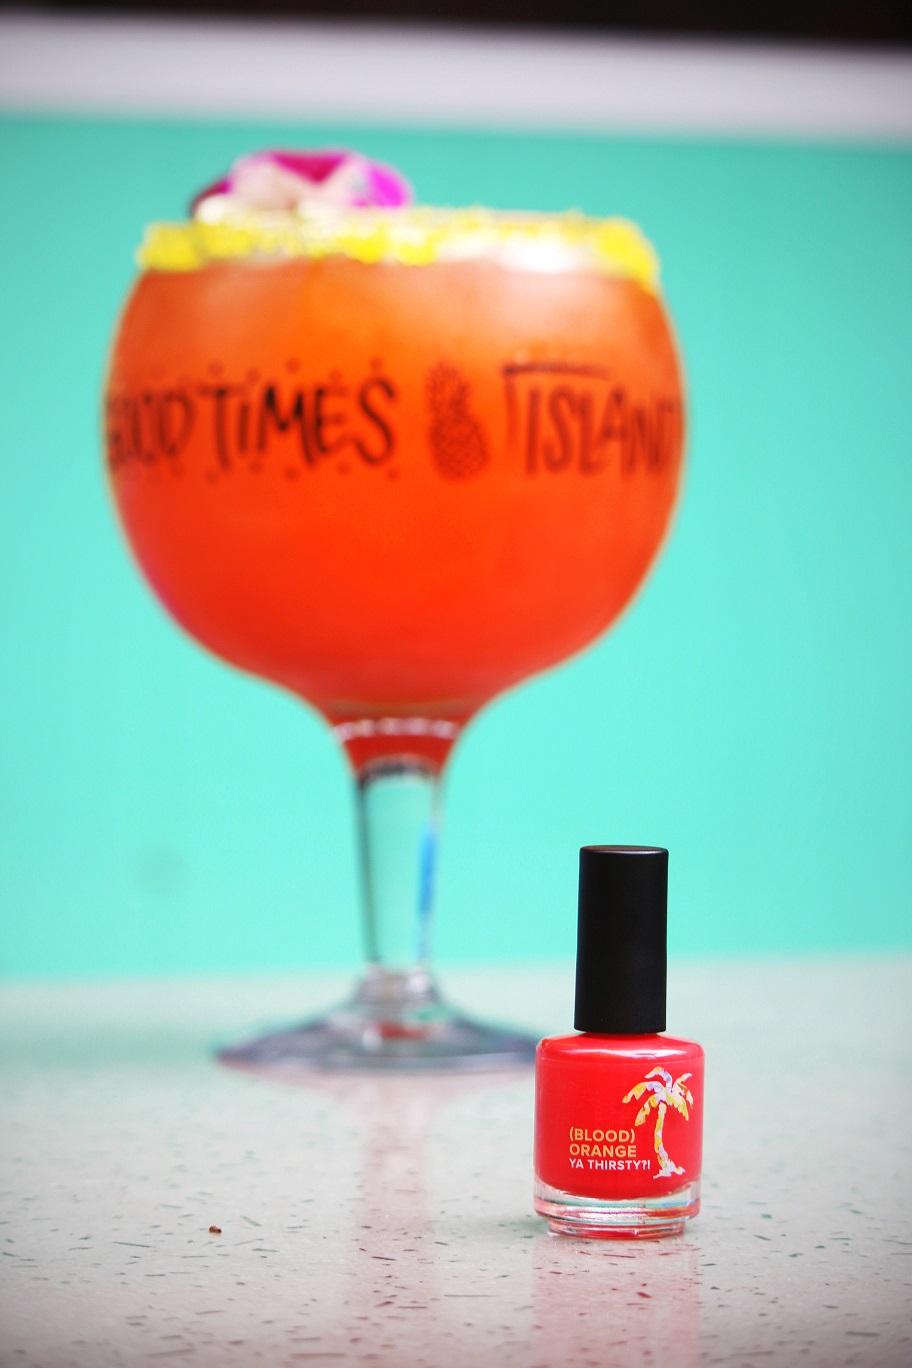 Blood Orange Ya Thirsty by Bahama Breeze